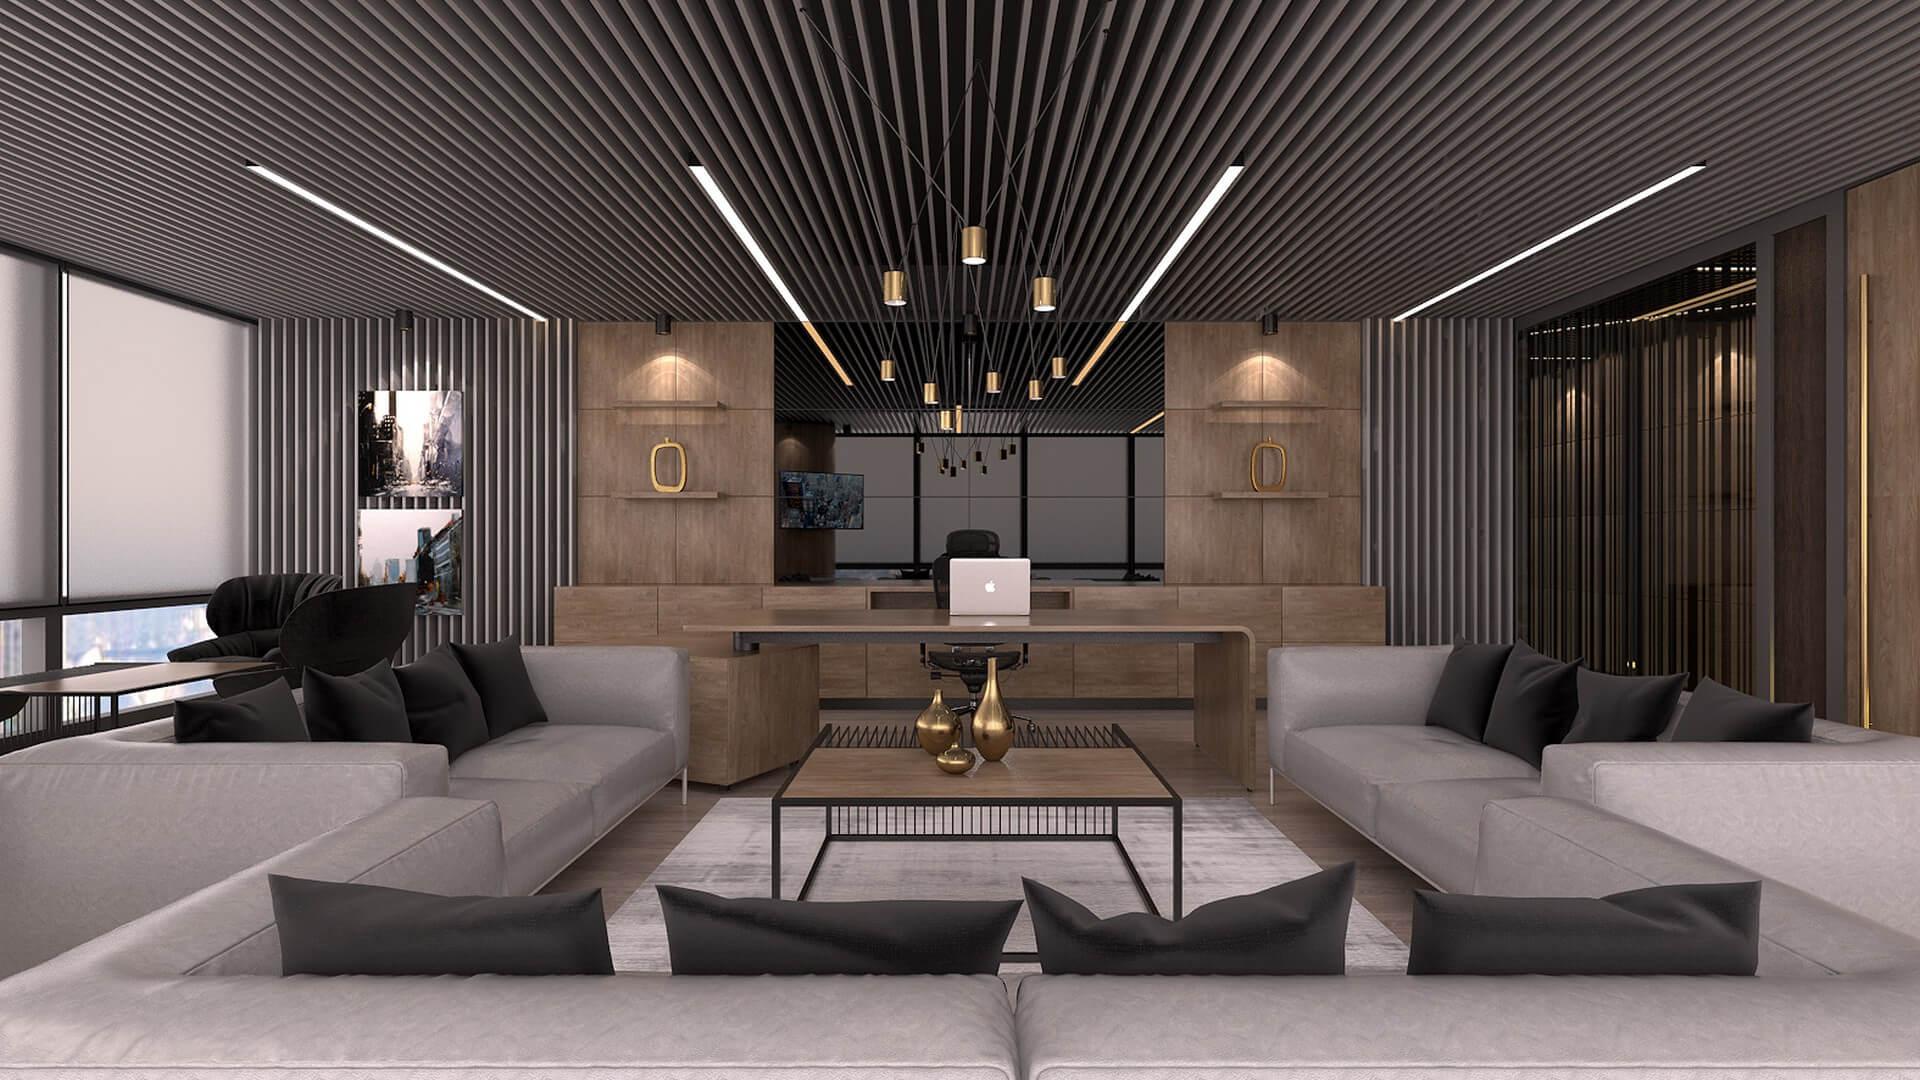 Hotel Architecture and Interior Design Bahar Construction